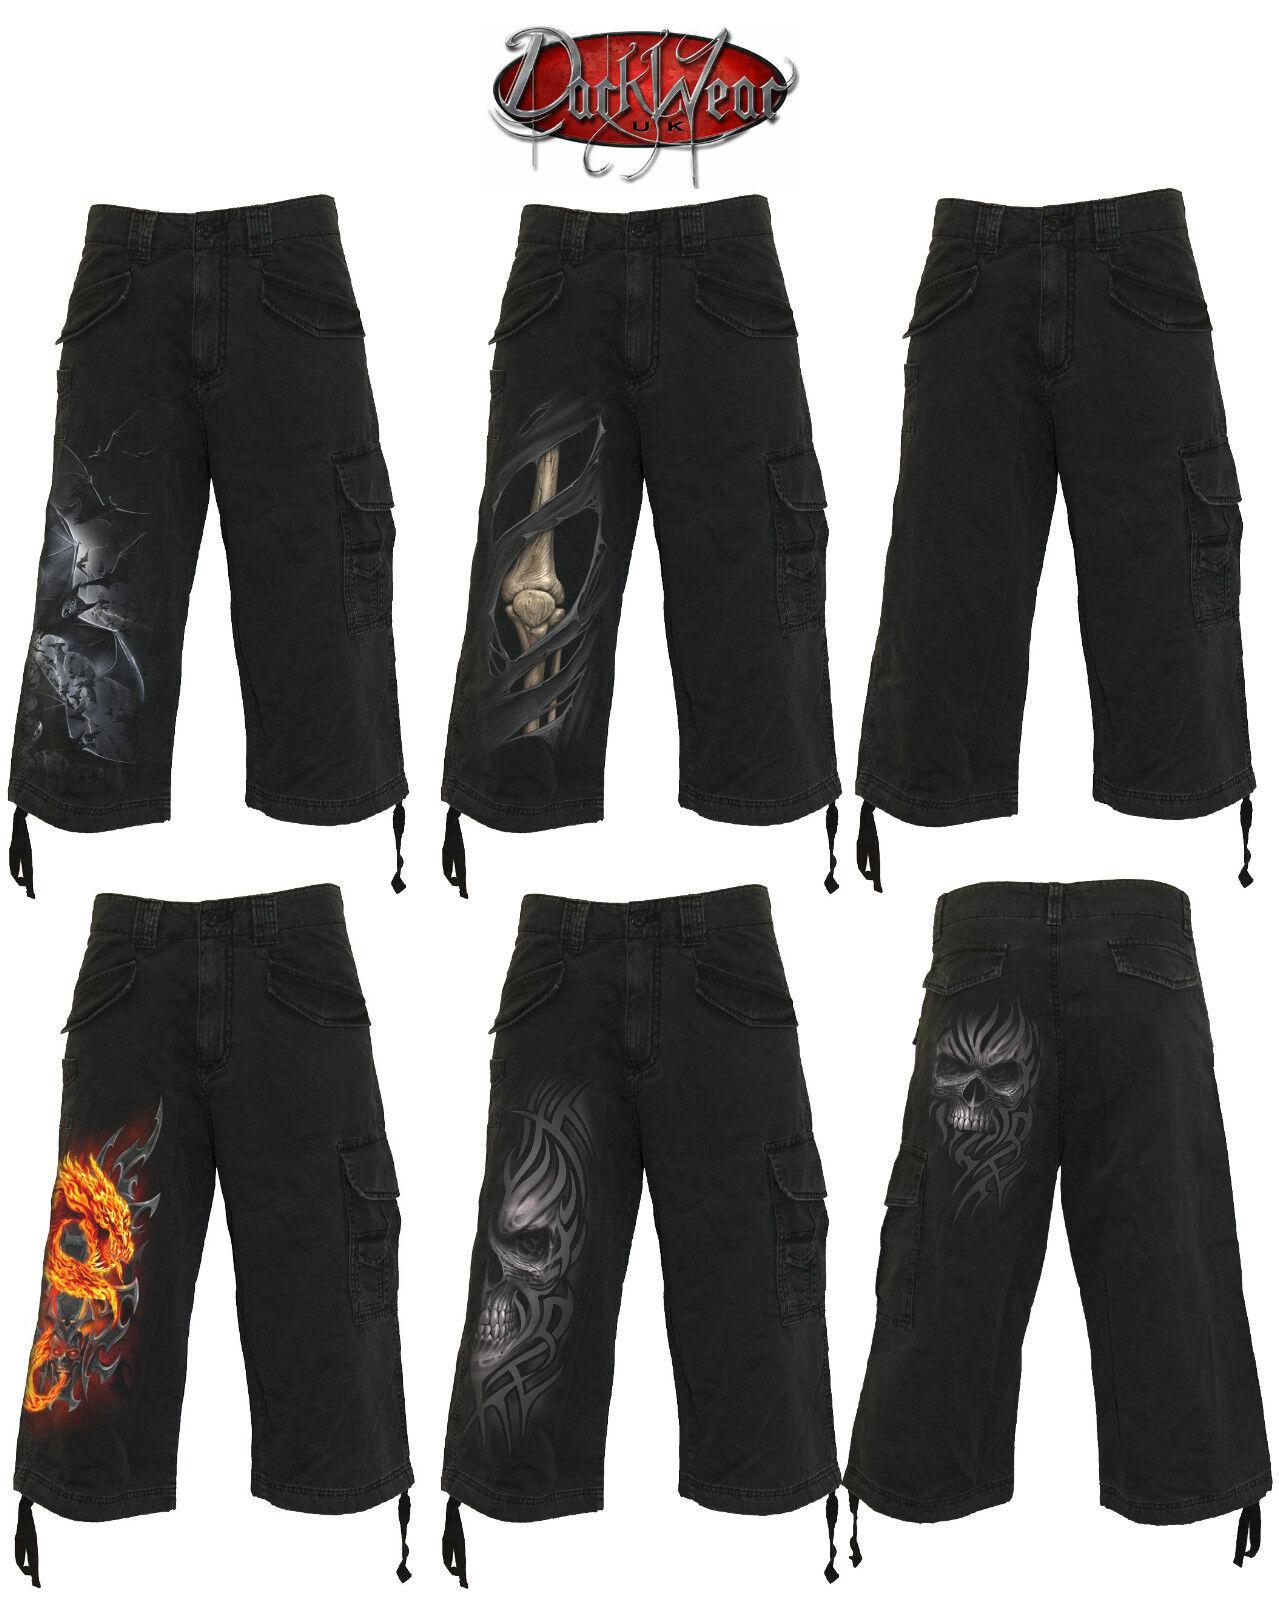 Spiral Direct Vintage Cargo Shorts 3 4 Lange black Schädel Skelett Drachen